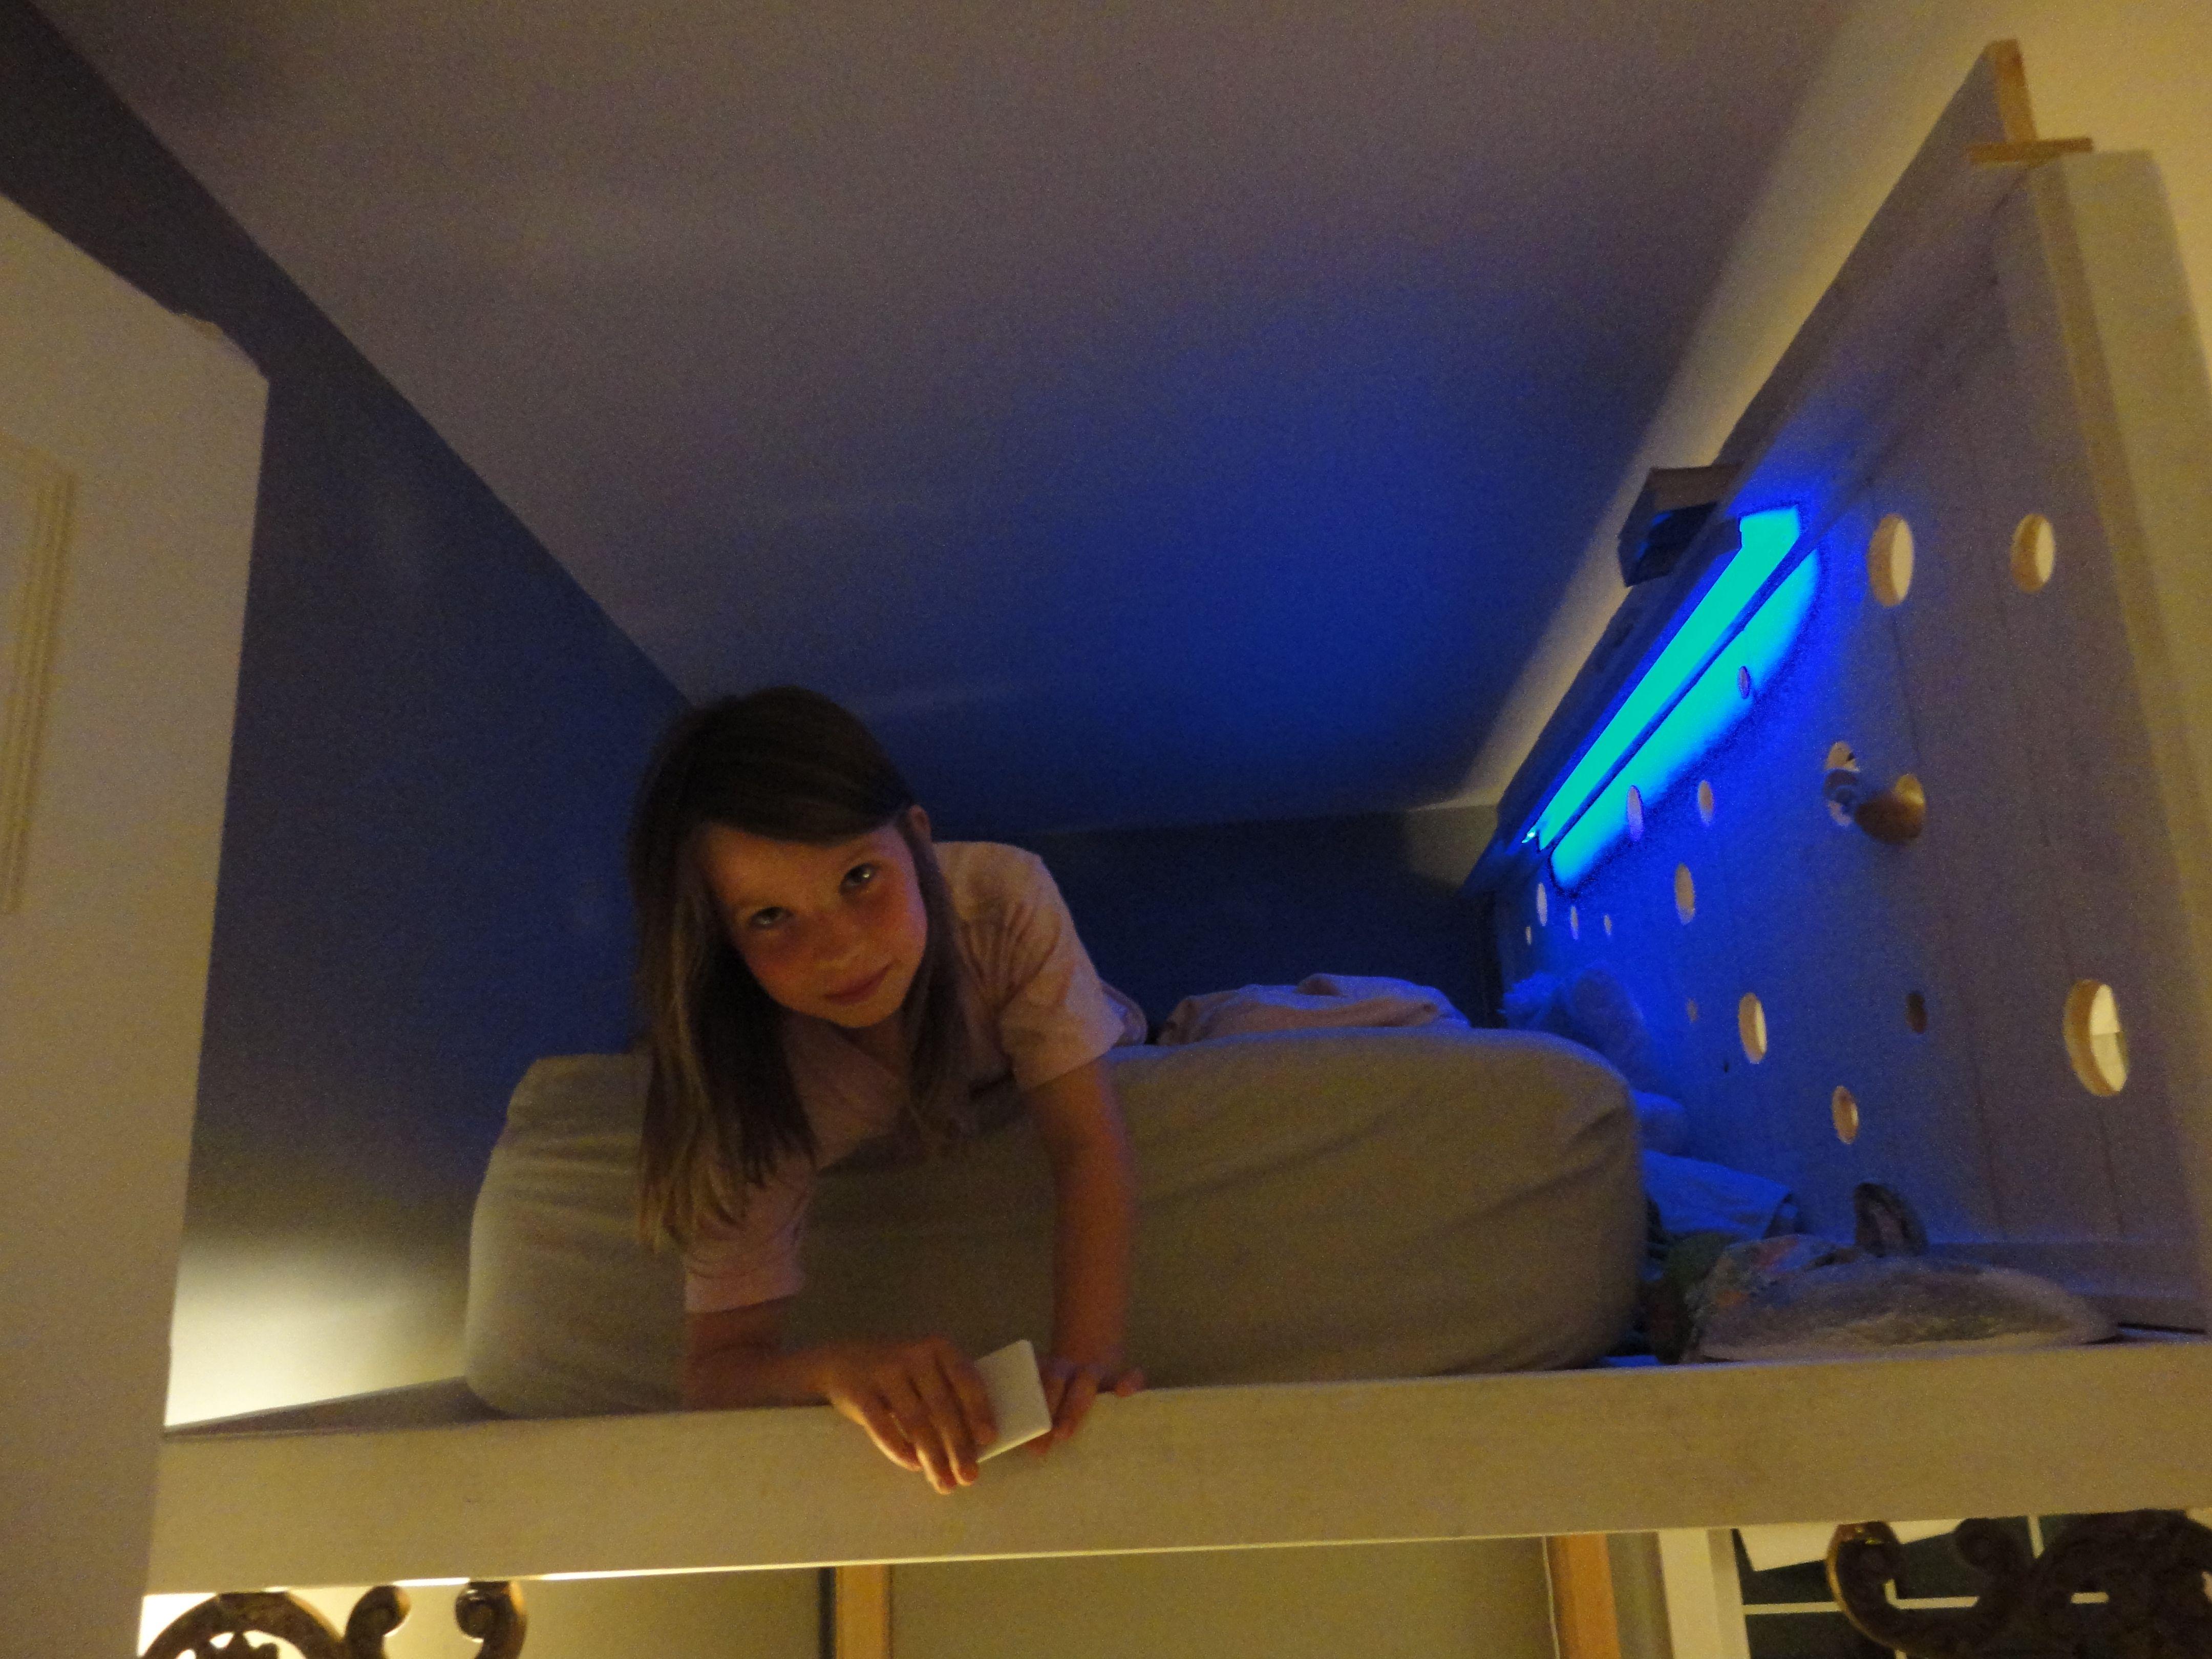 Loft Bed W Led Lights For The Kids Pinterest Lofts